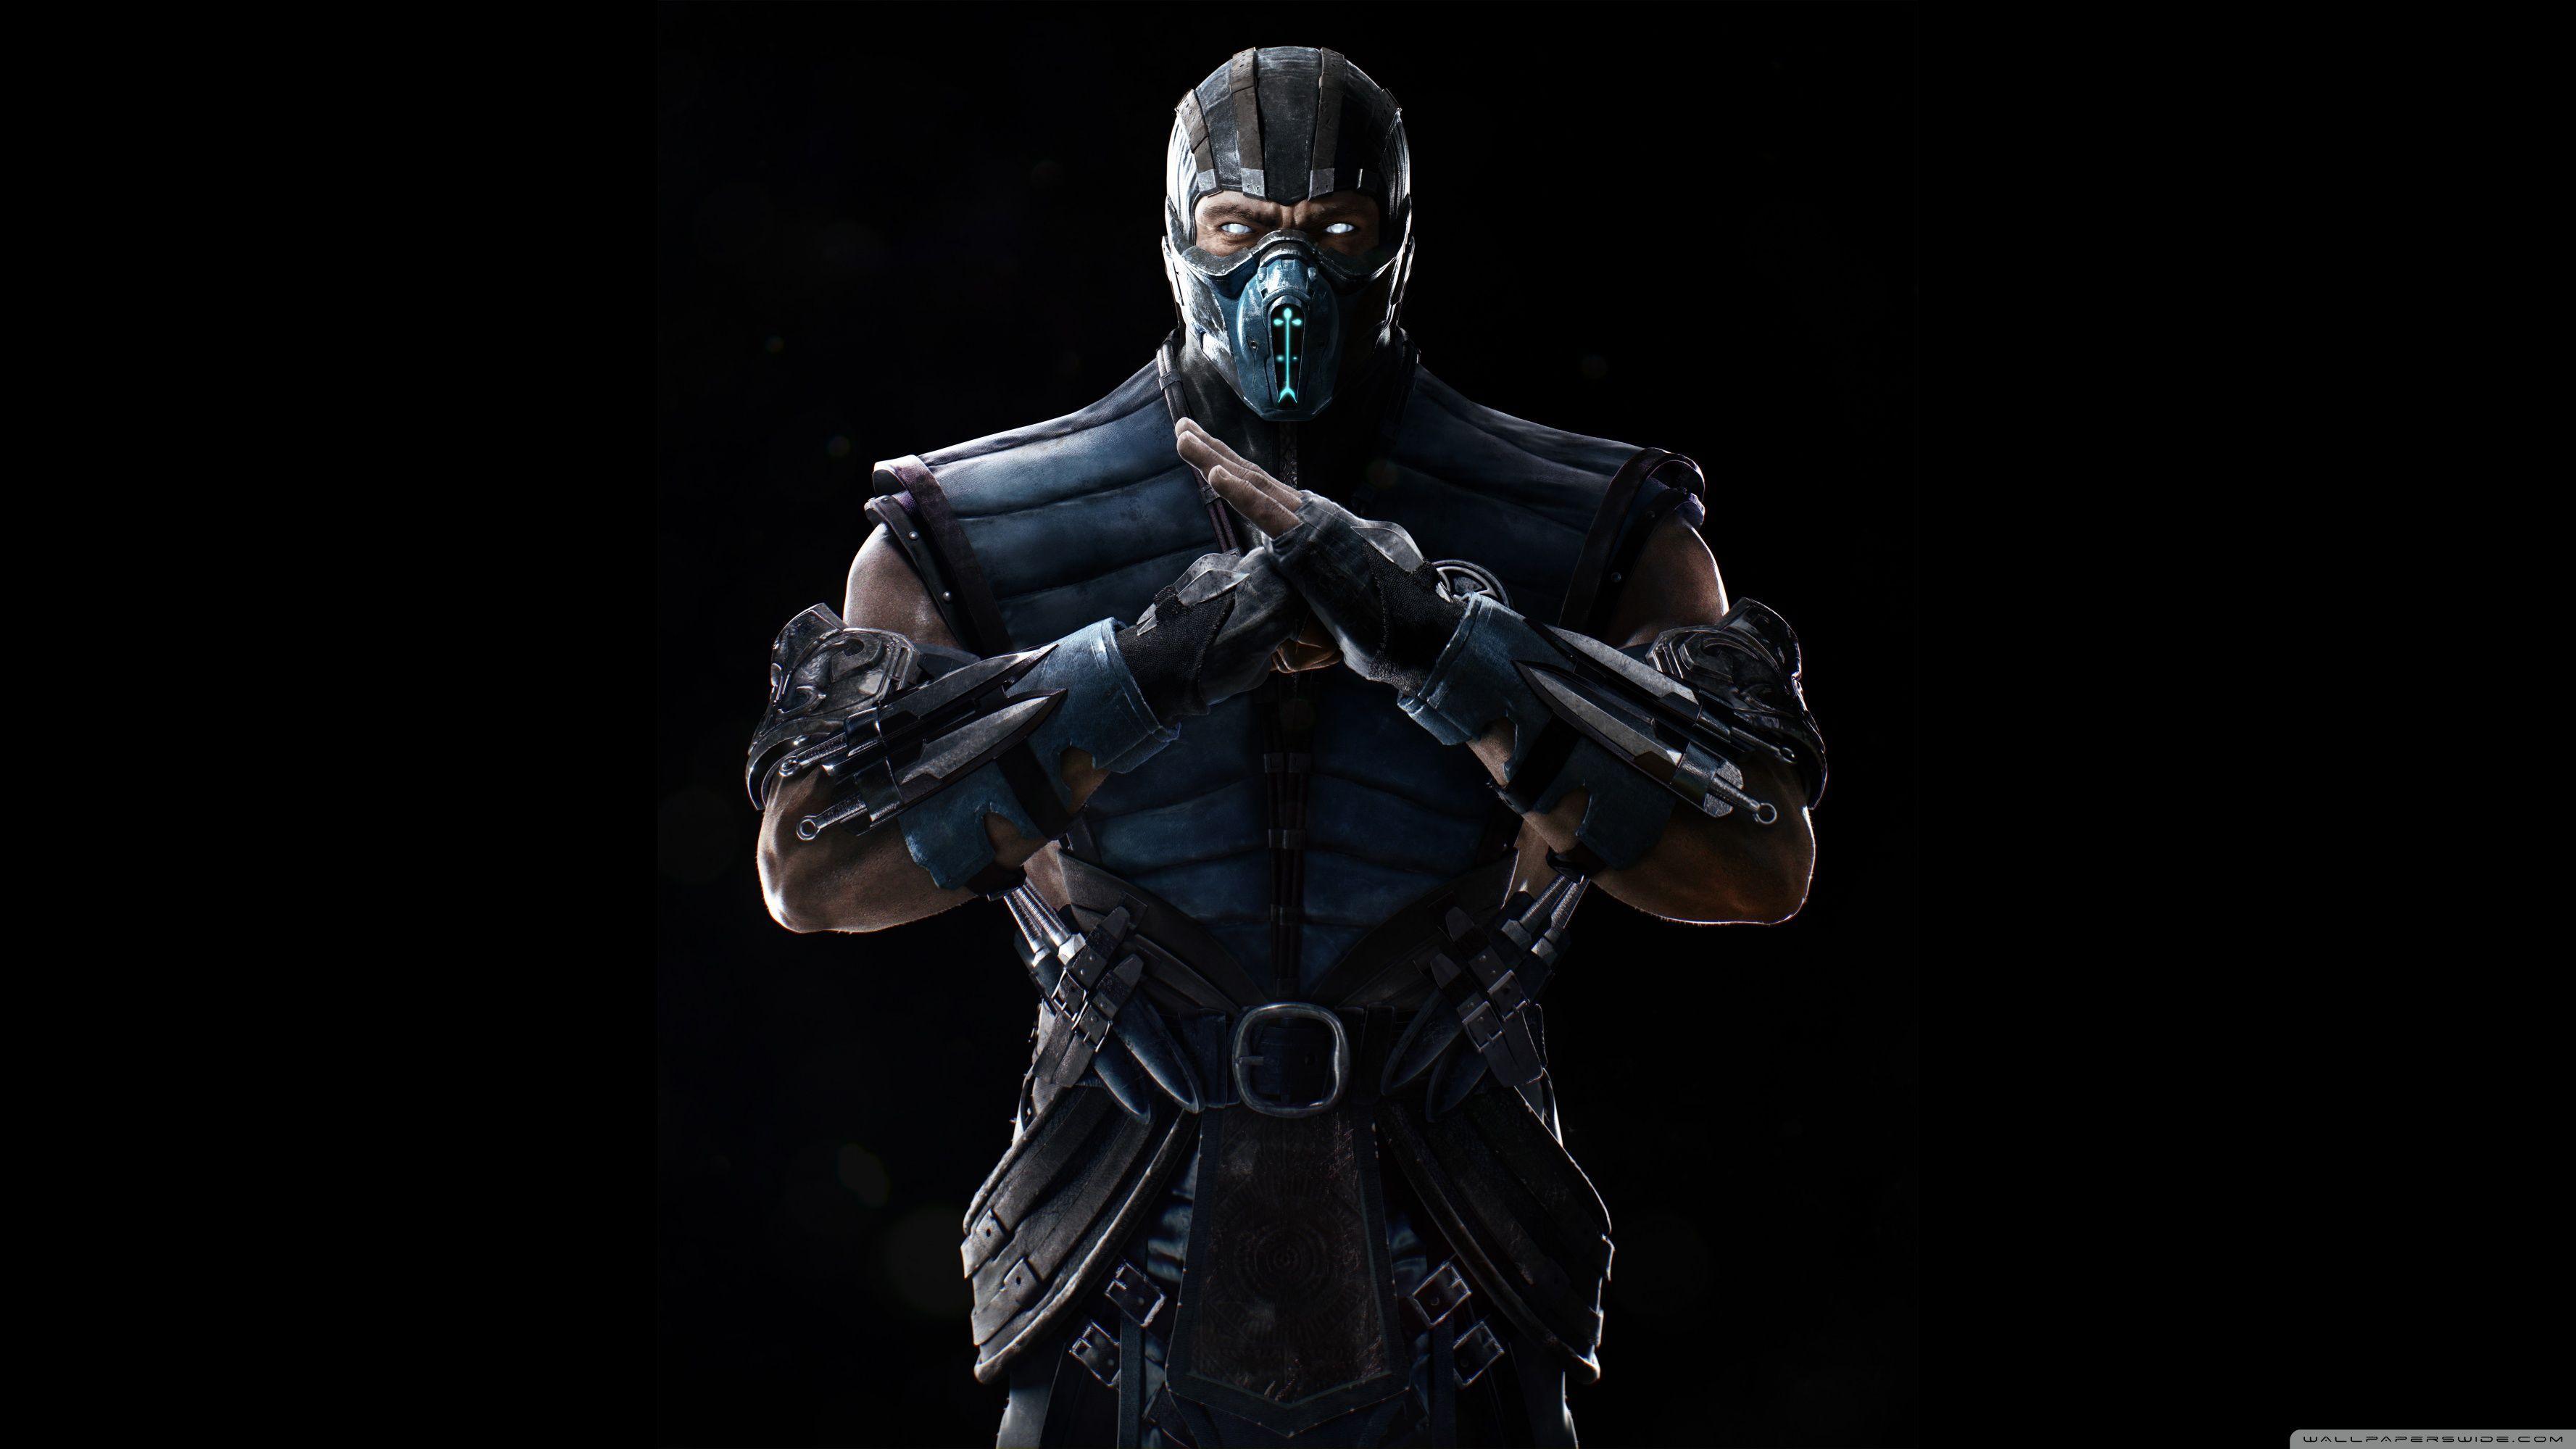 Mortal Kombat 9 Sub-Zero Wallpapers - Top Free Mortal Kombat